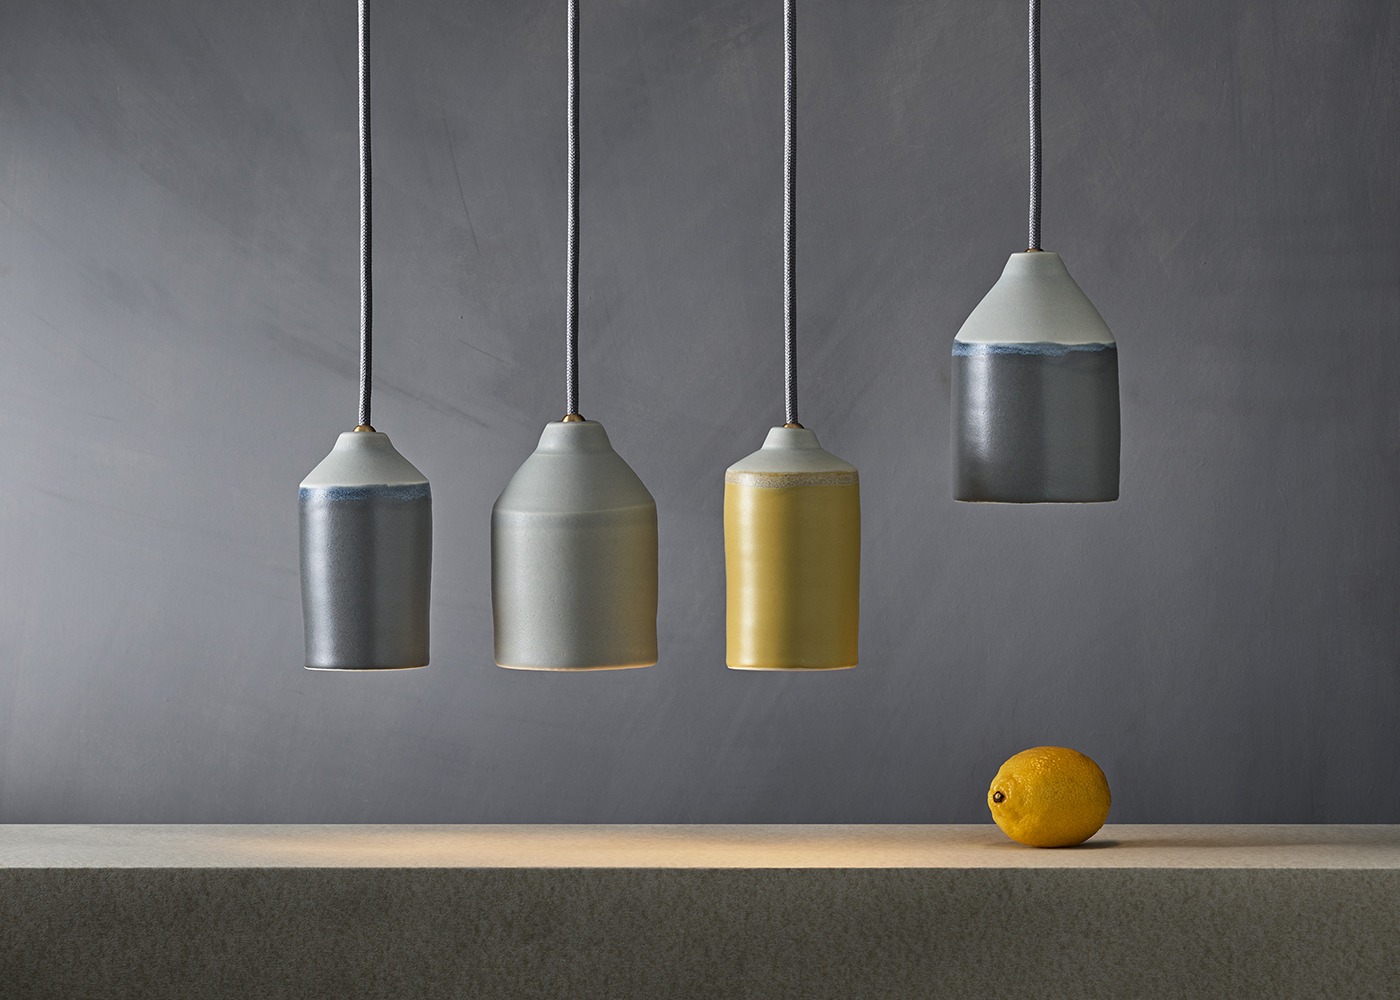 'Morandi' porcelain light shades